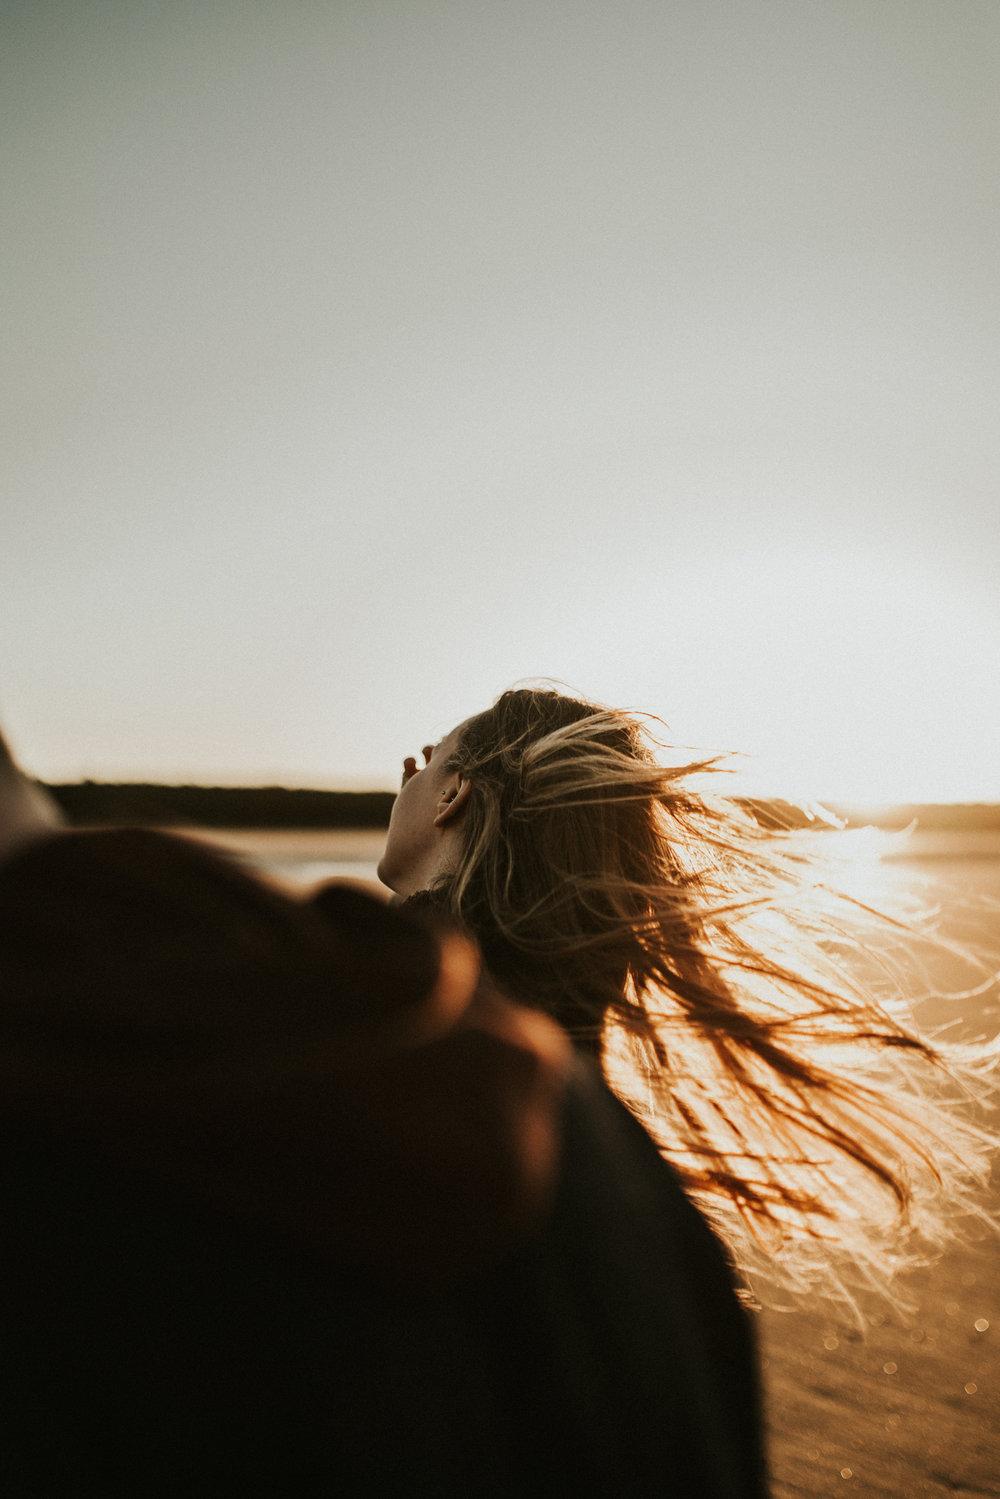 Luke-Mary-Engagement-Adventure-Session-Norfolk-Photography-Photographer-Darina-Stoda-52.jpg